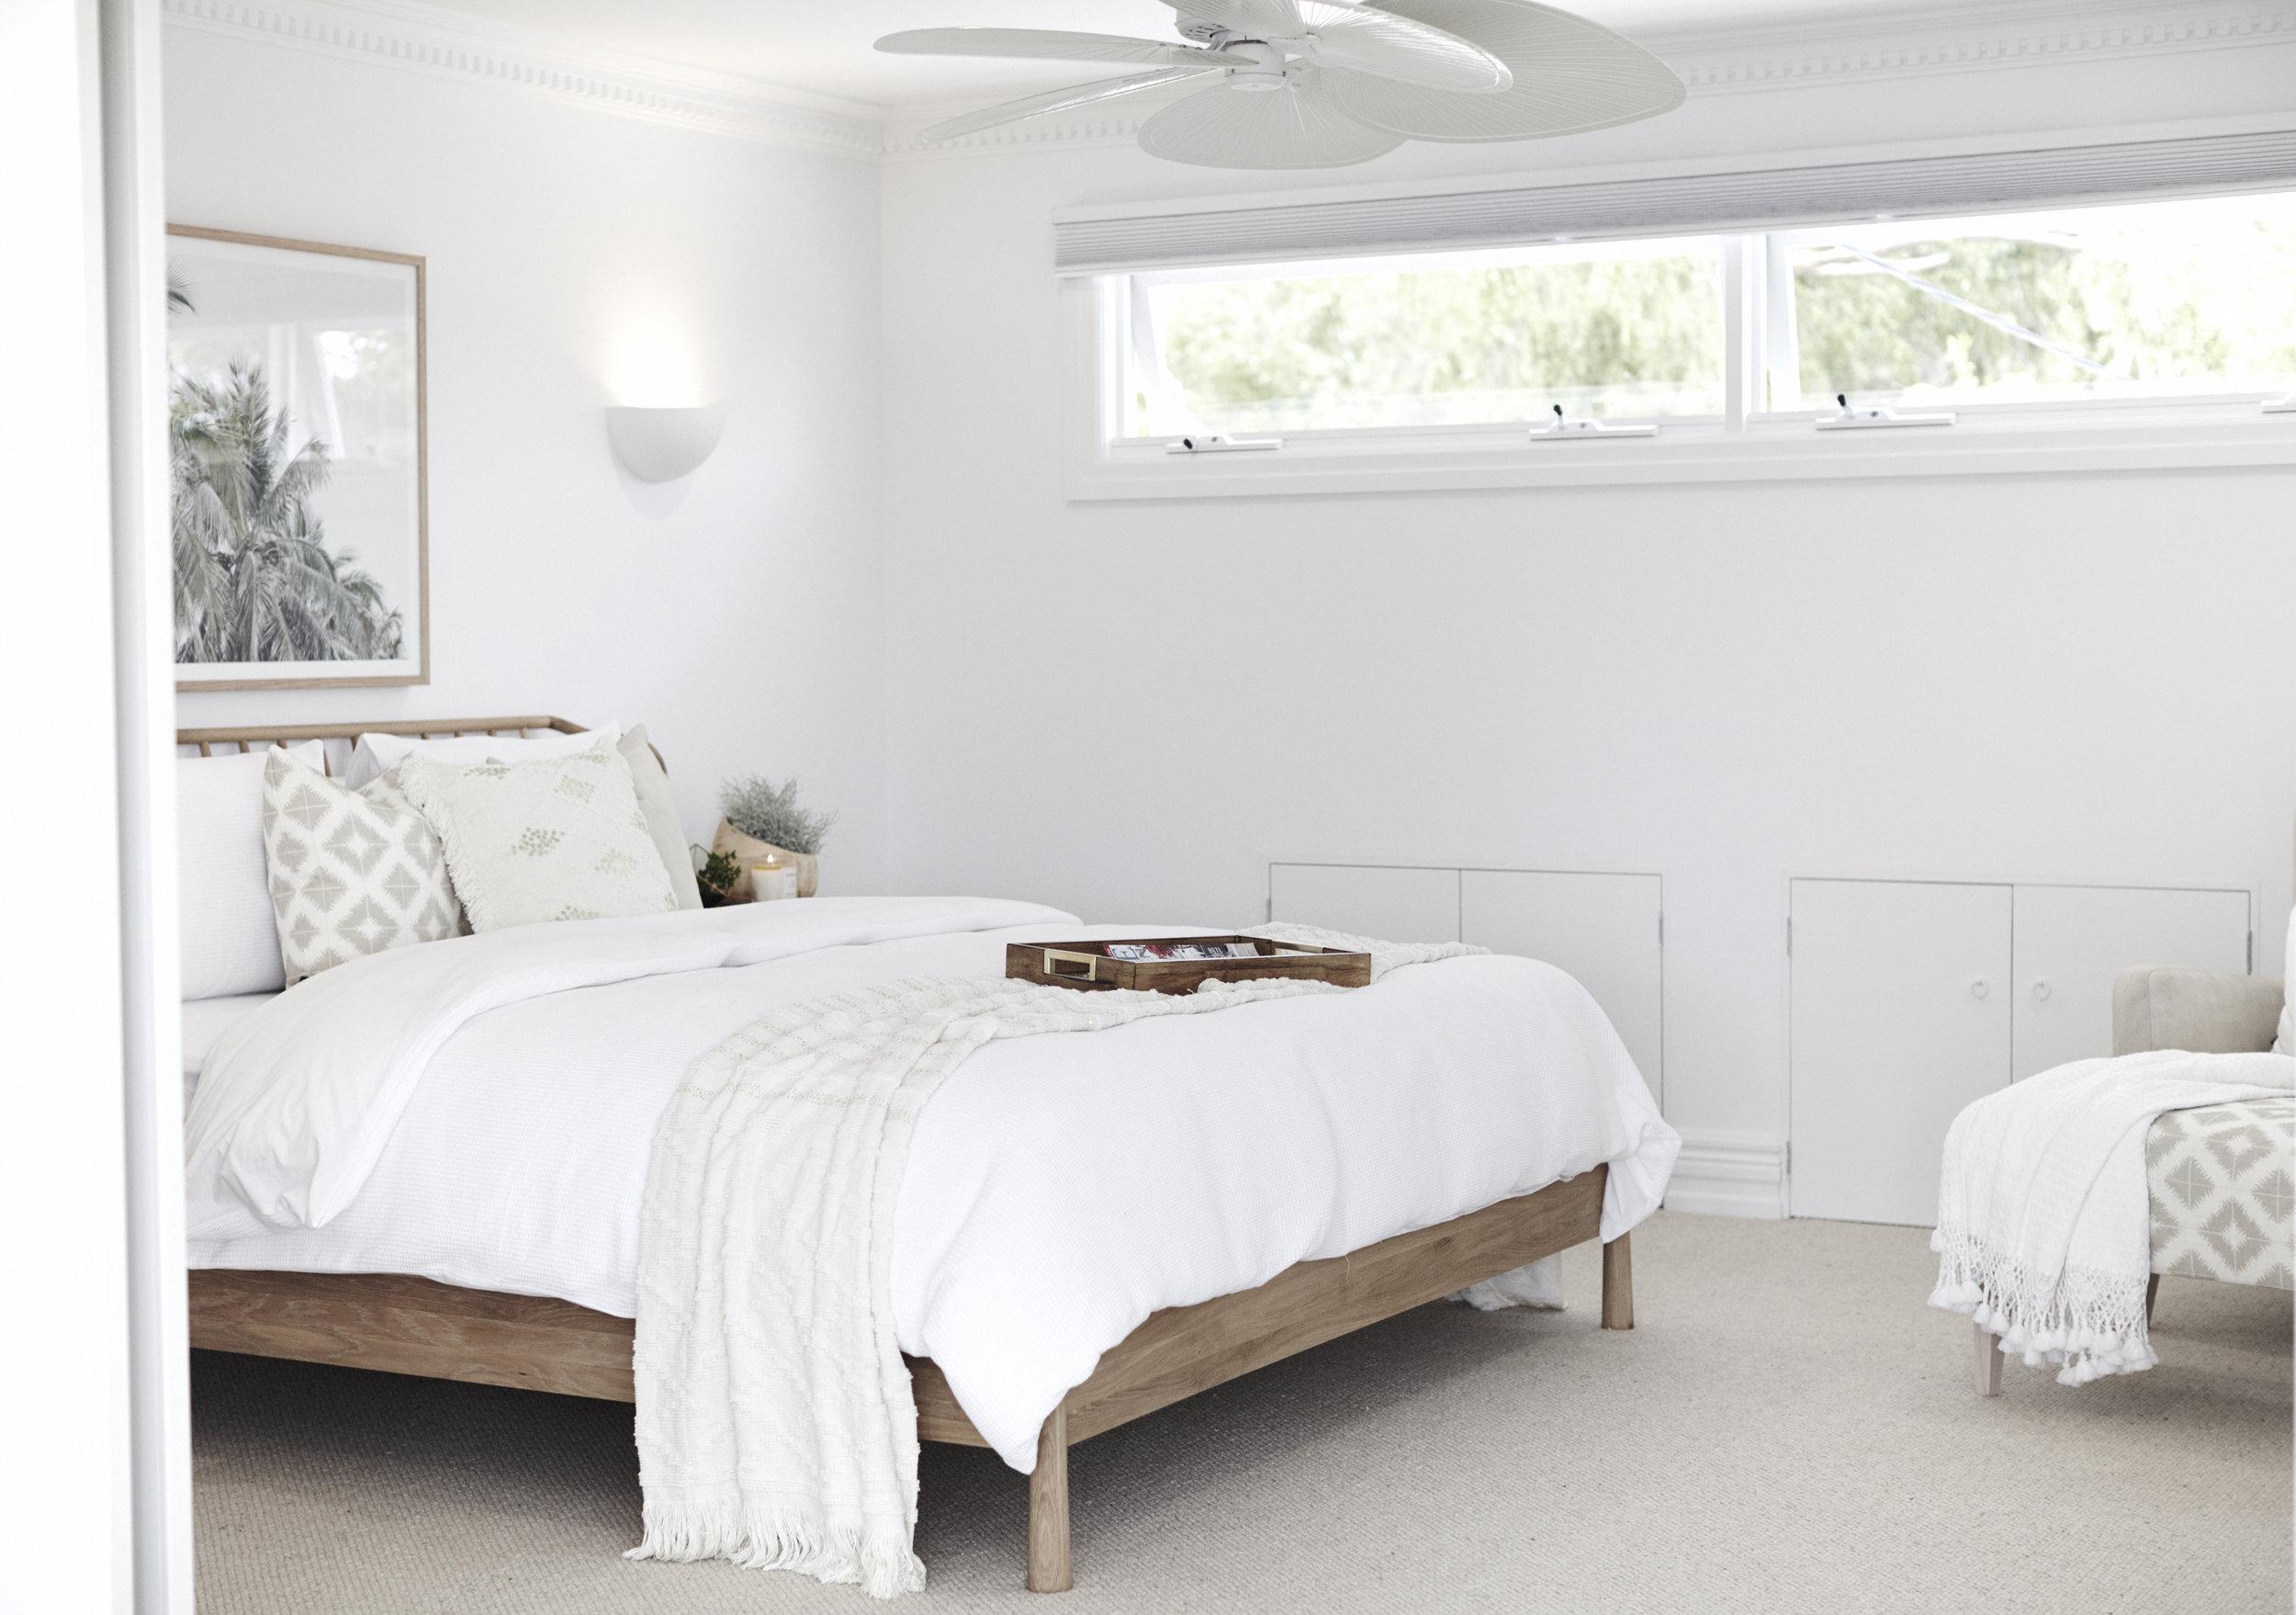 Lana's forever home bedroom